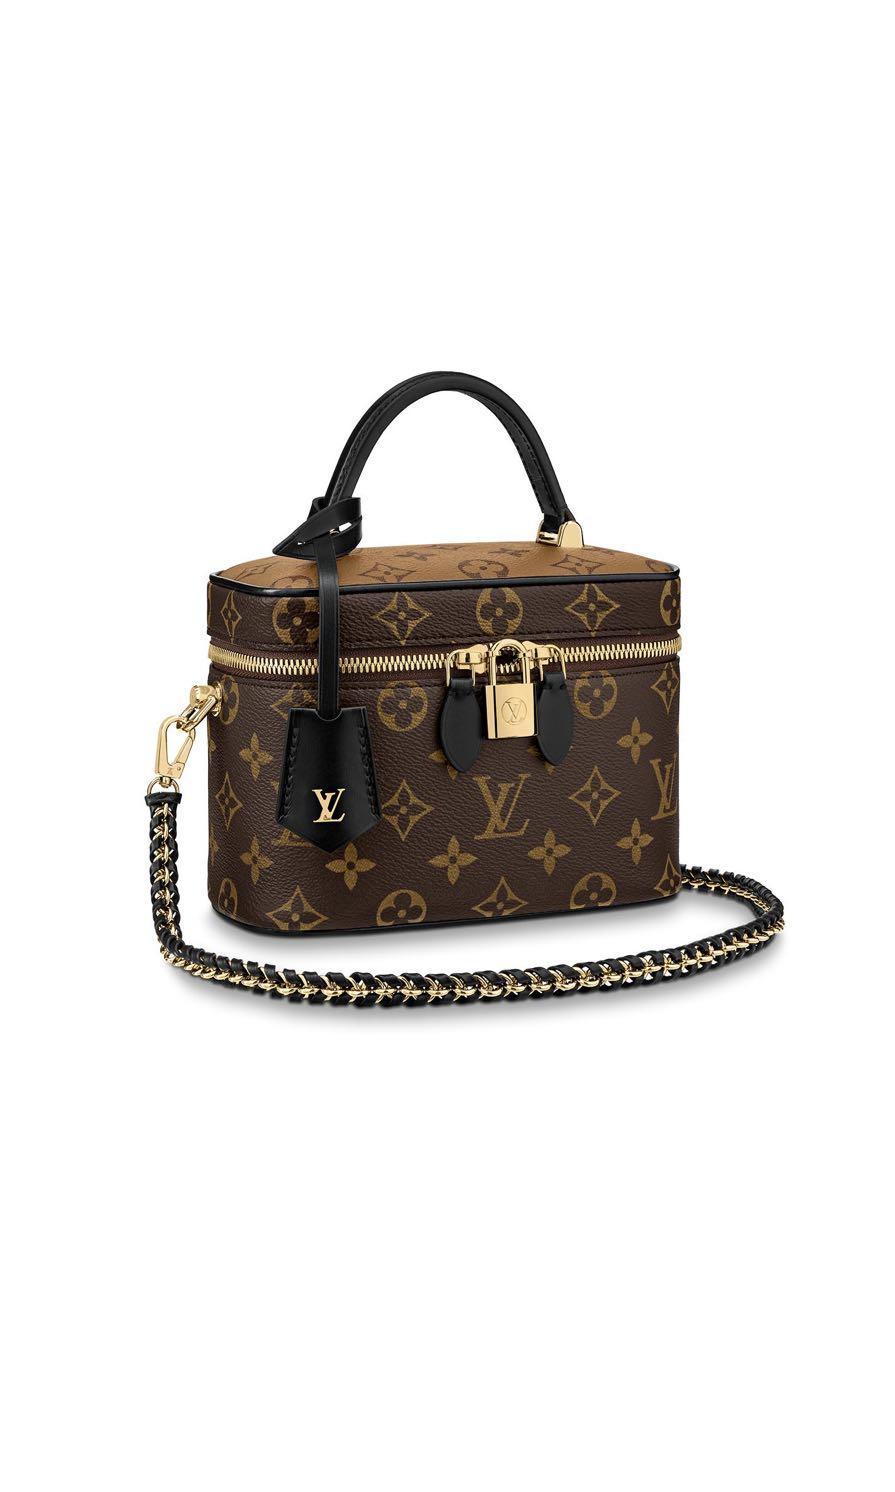 LV Louis Vuitton Vanity PM